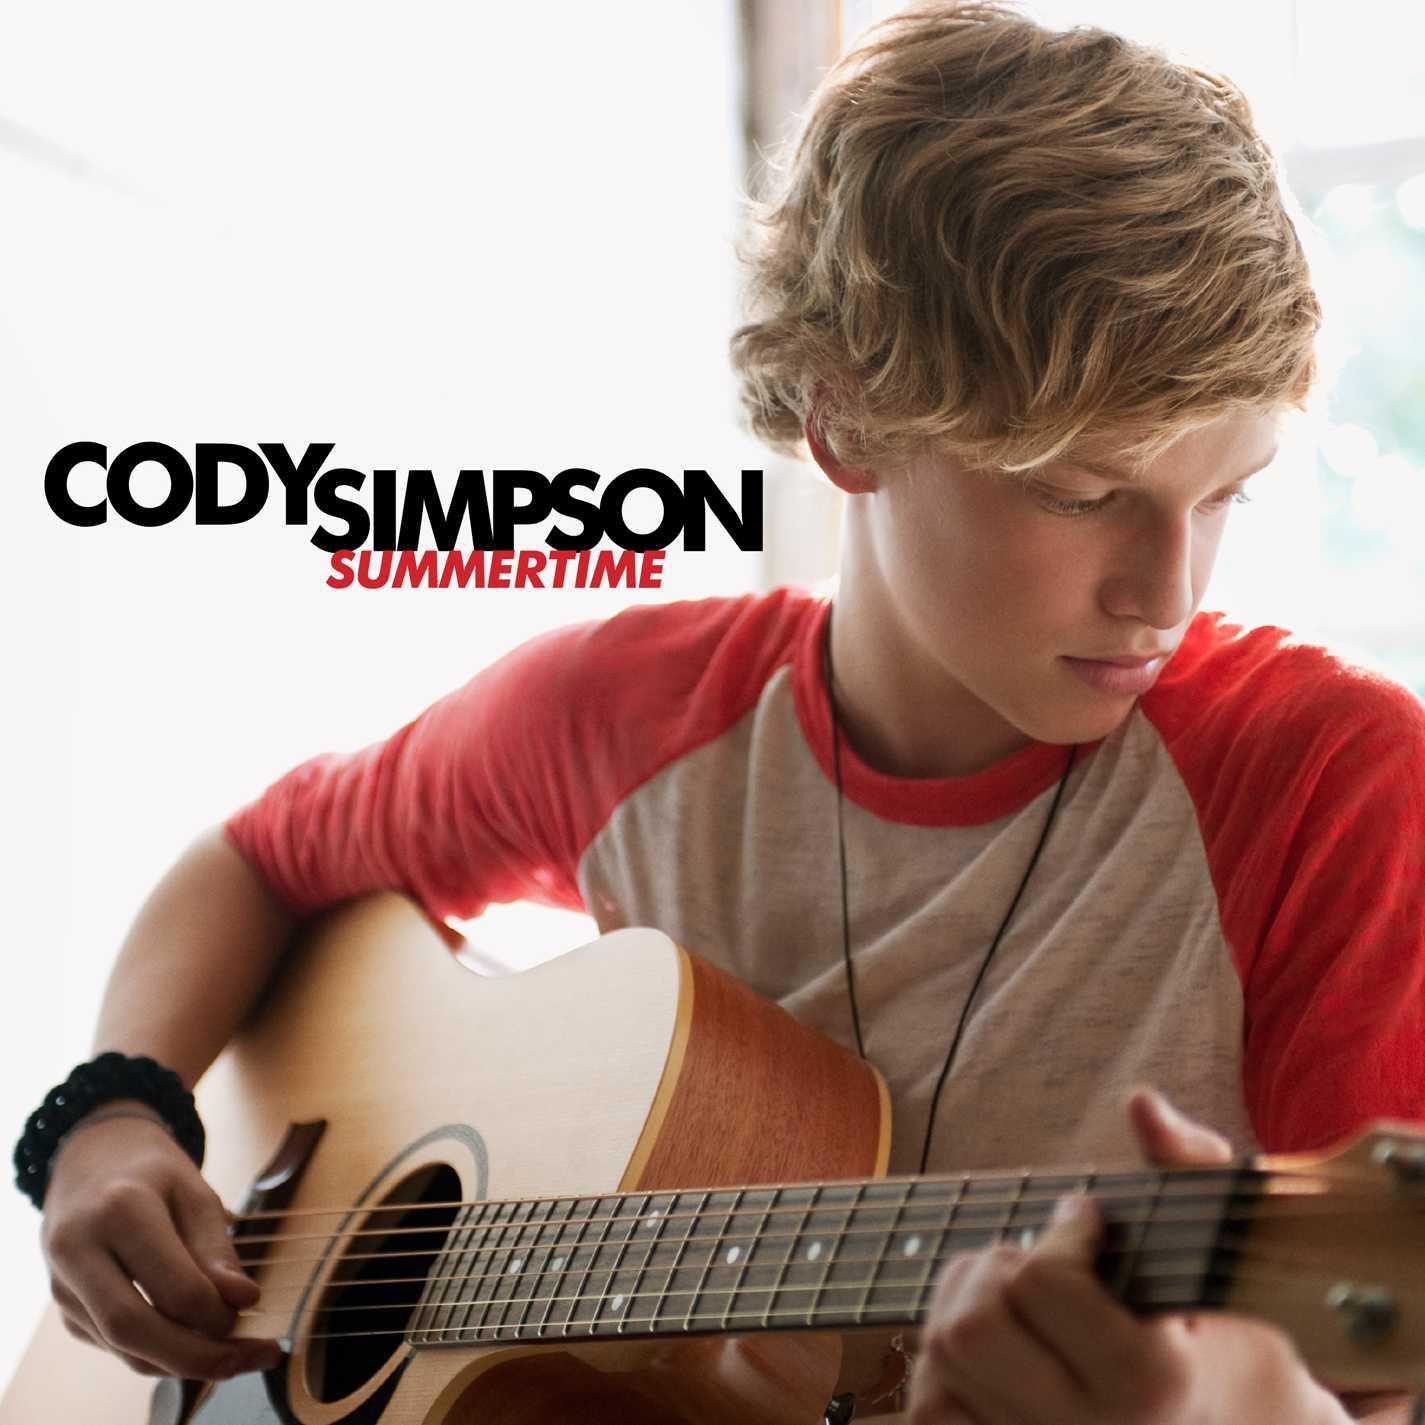 http://4.bp.blogspot.com/-yhsFlRj0f_g/TeoBGN4aZpI/AAAAAAAAACw/5MjItCFZ4dA/s1600/Cody+Simpson+-+Summertime.jpg